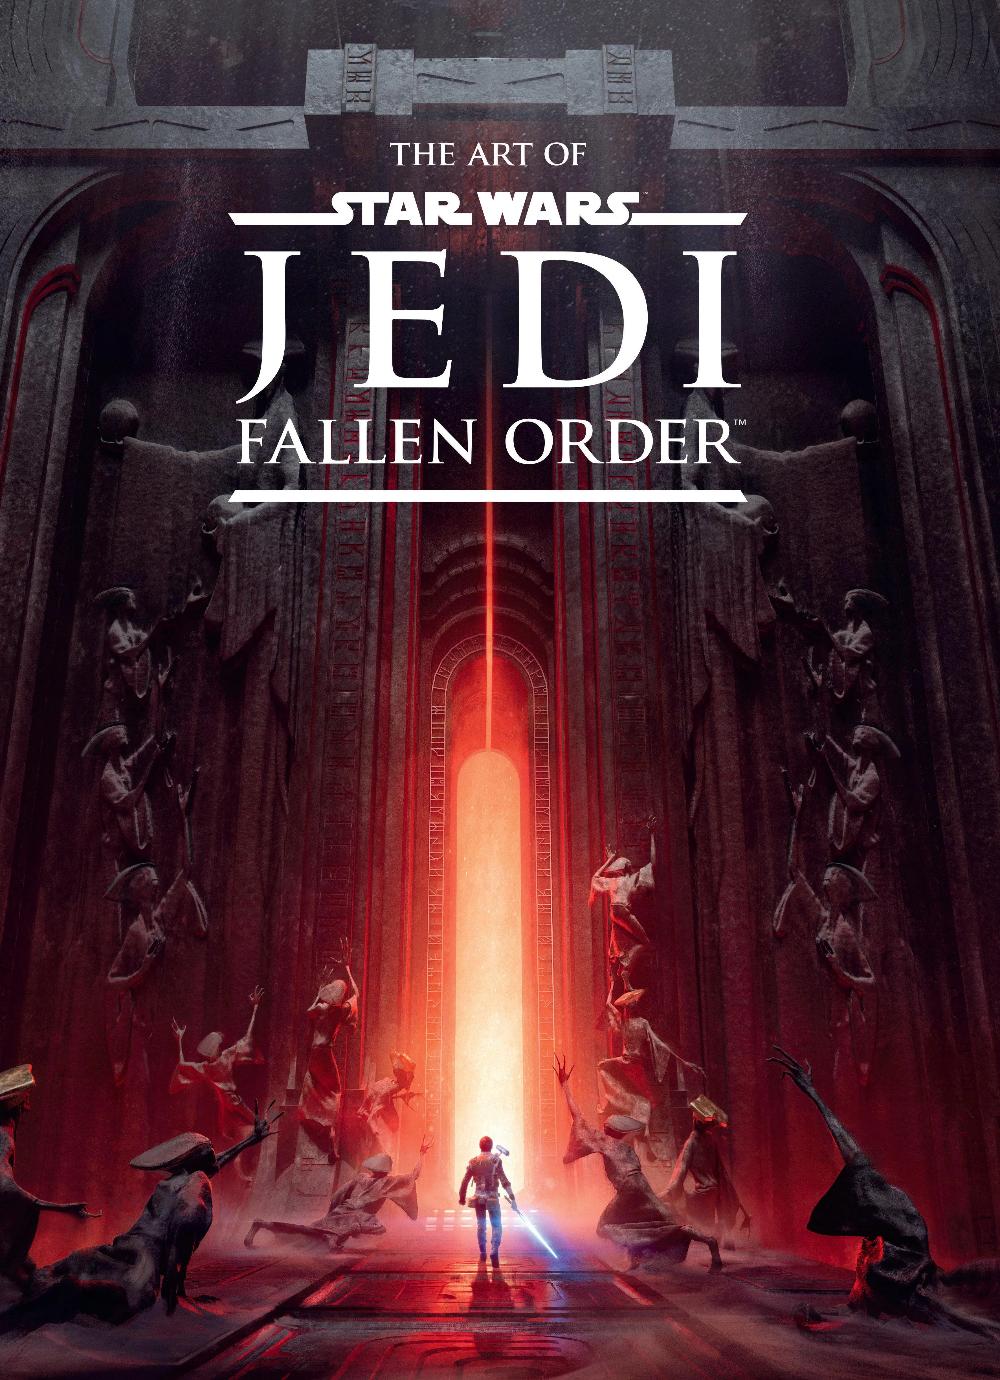 25 Star Wars Jedi Fallen Order Beautiful Wallpapers Including New